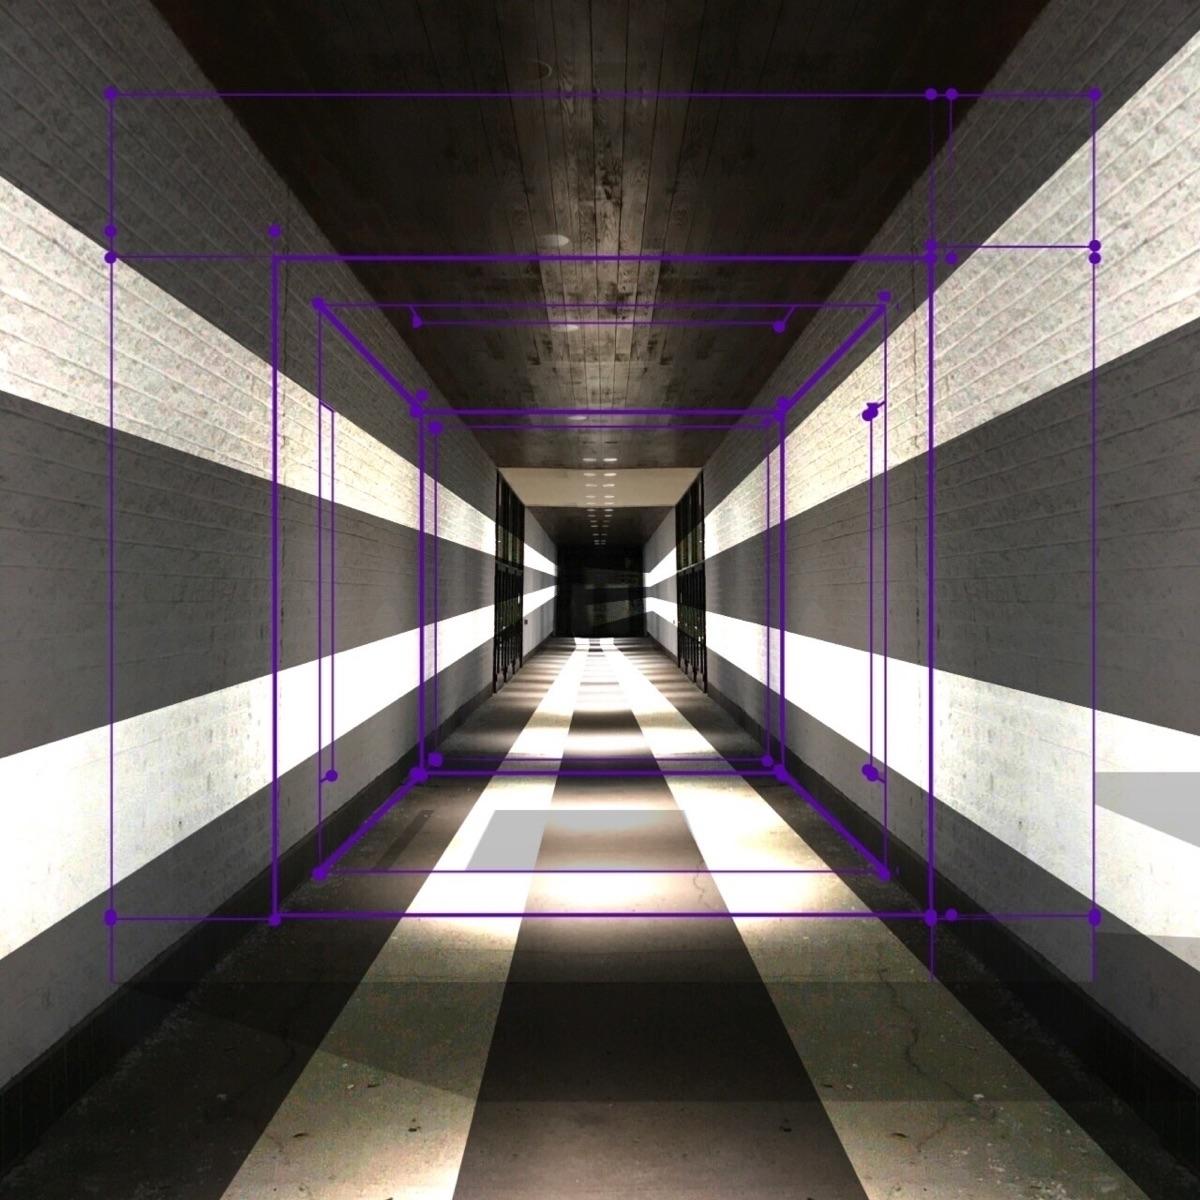 Verisimilitude art iphoneograph - photografia | ello